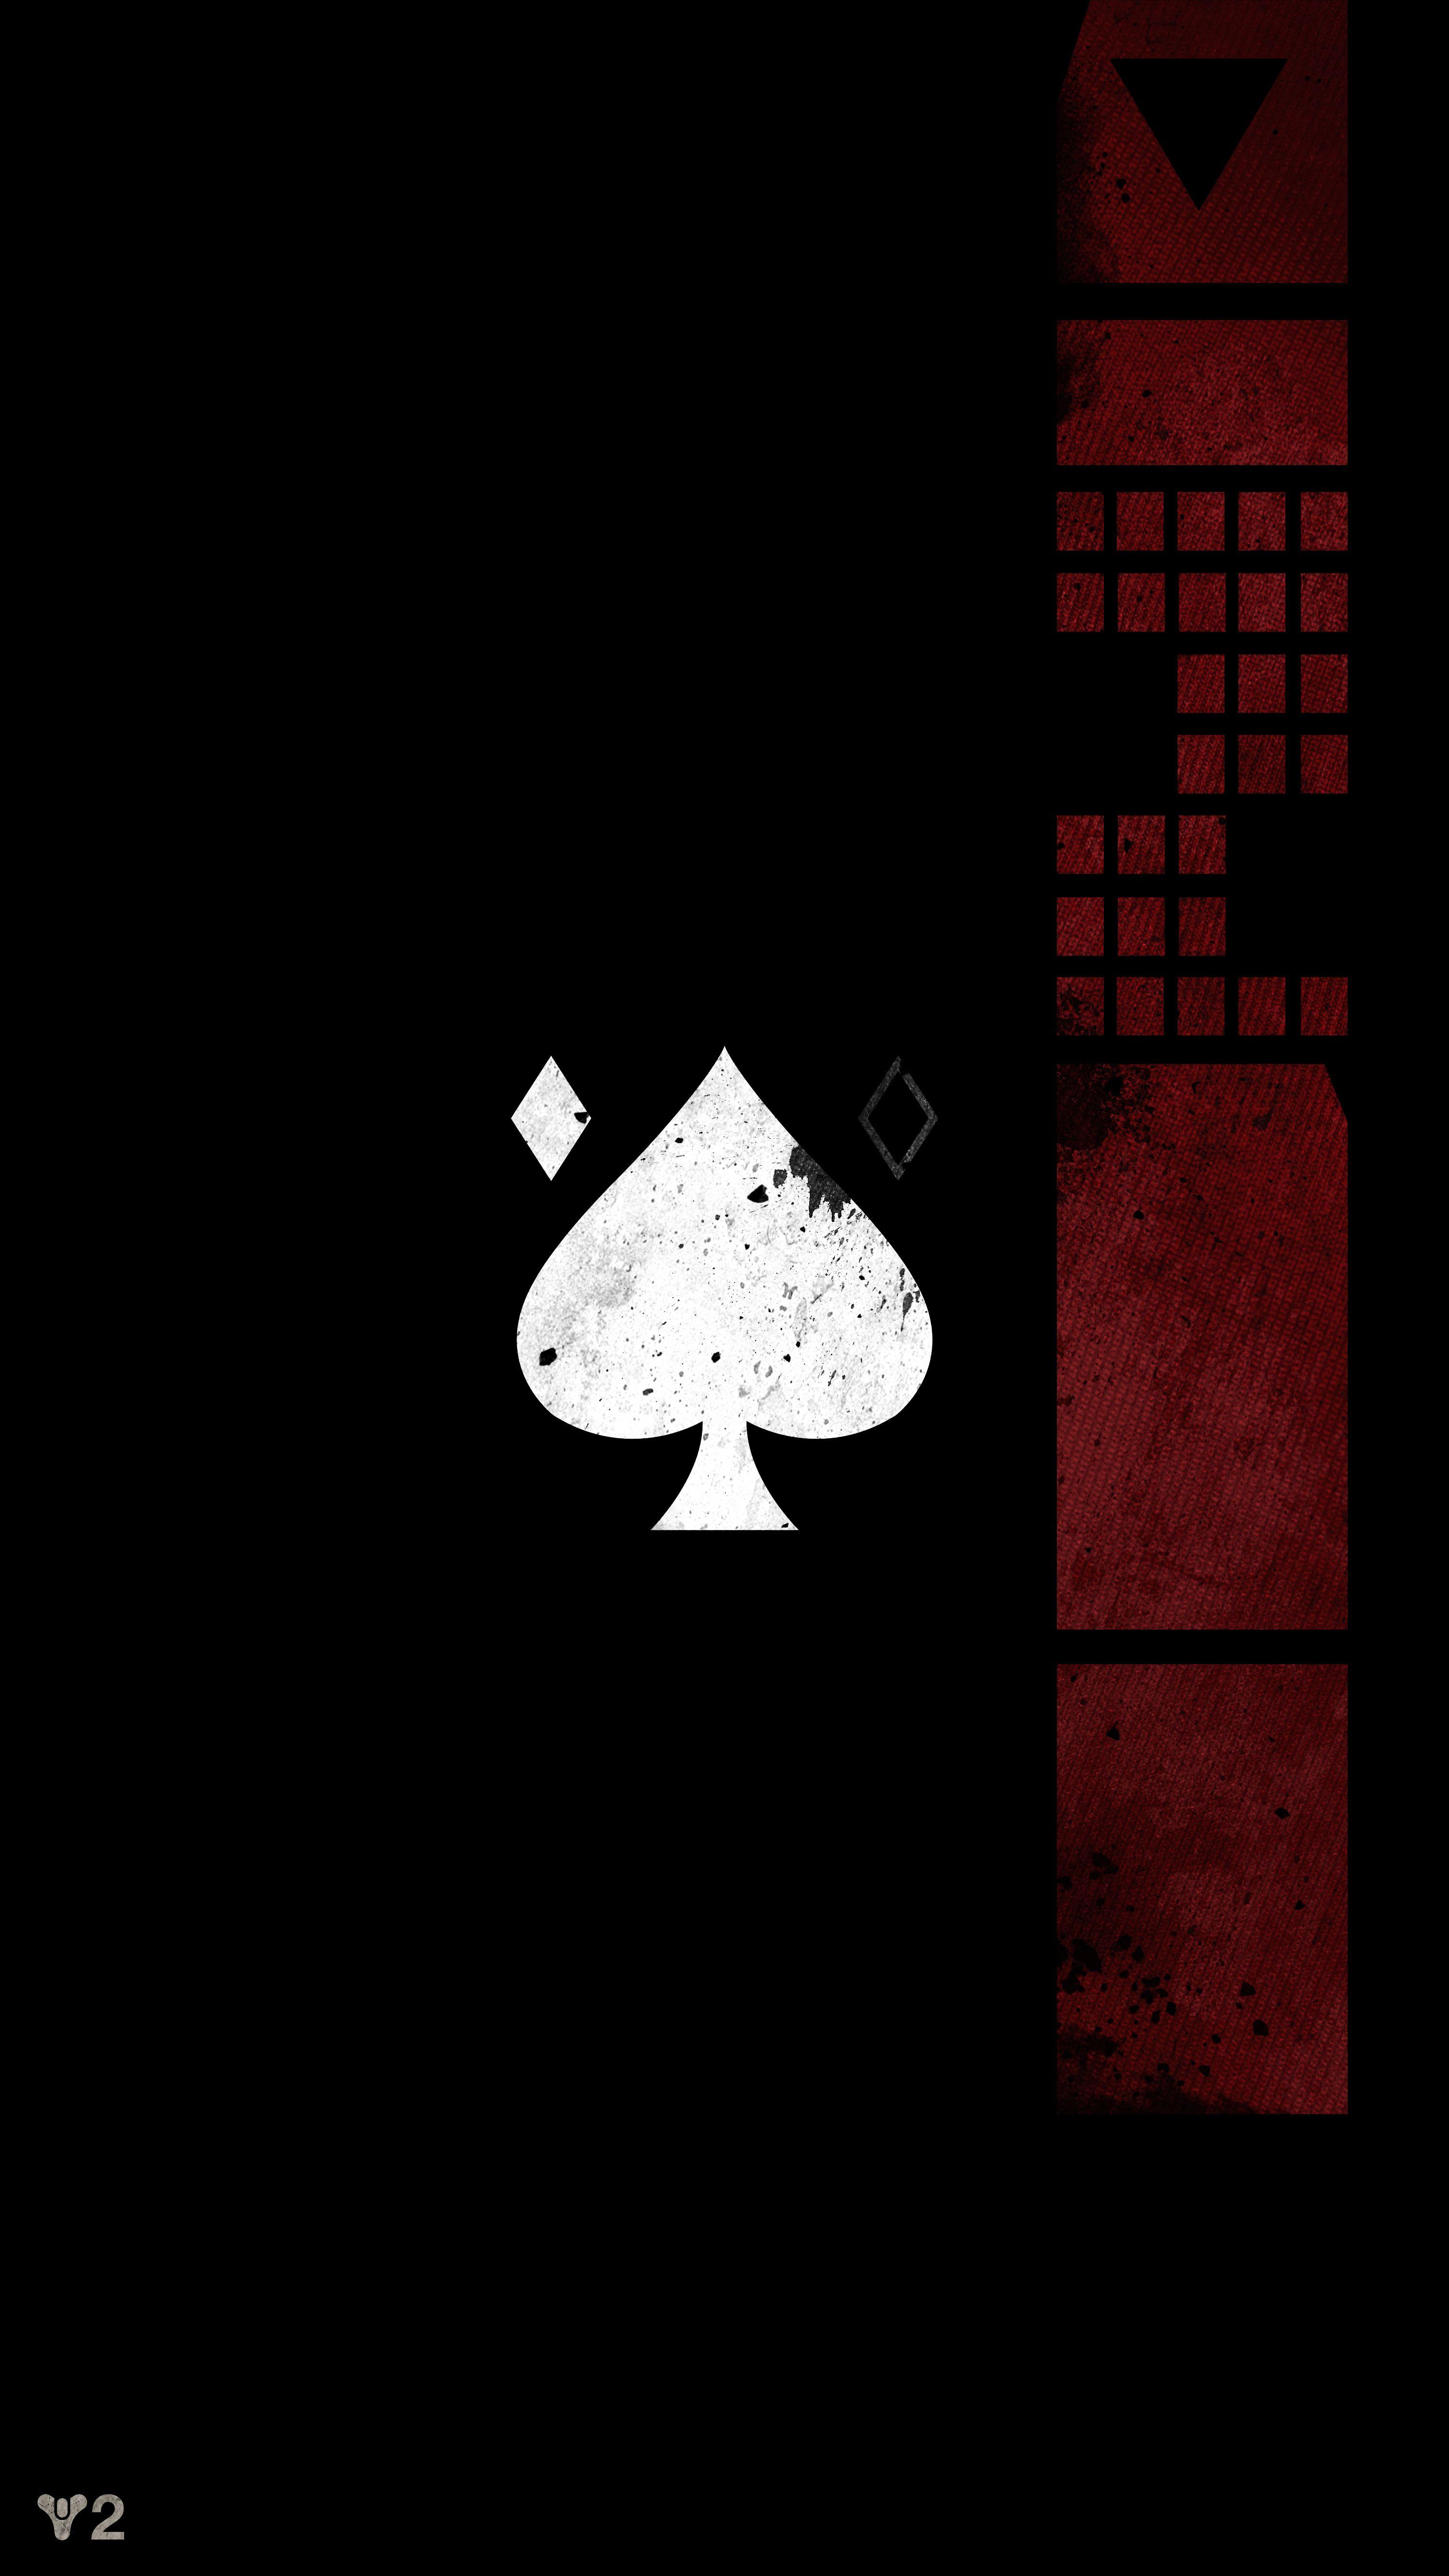 Ace Of Spades Emblem Mobile Wallpaper Destiny Game Destiny Tattoo Destiny Backgrounds